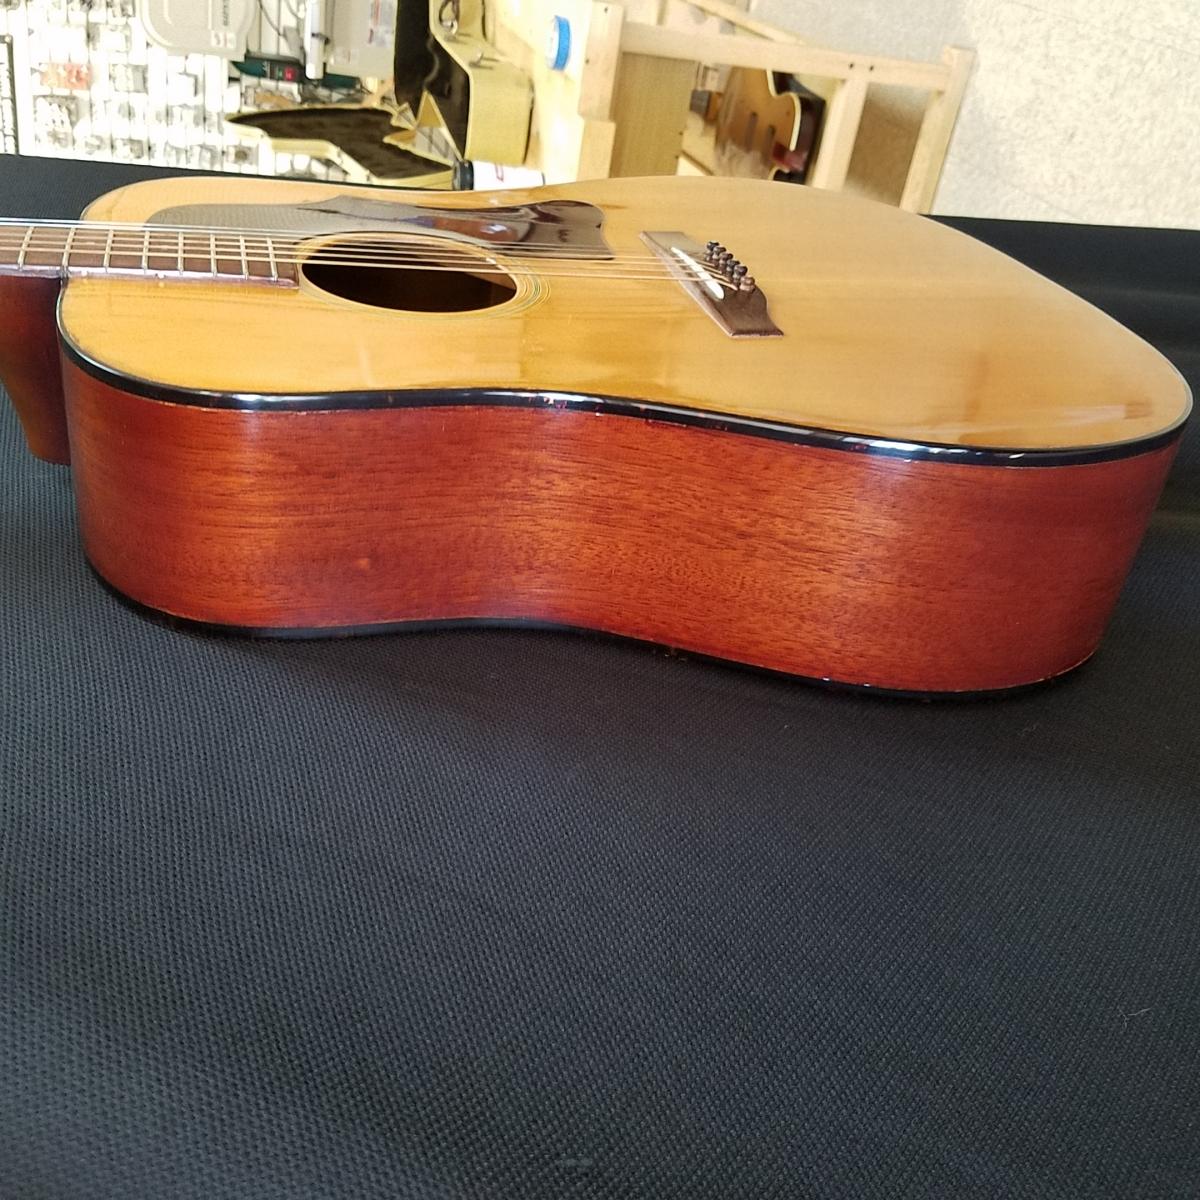 Gibson J-55